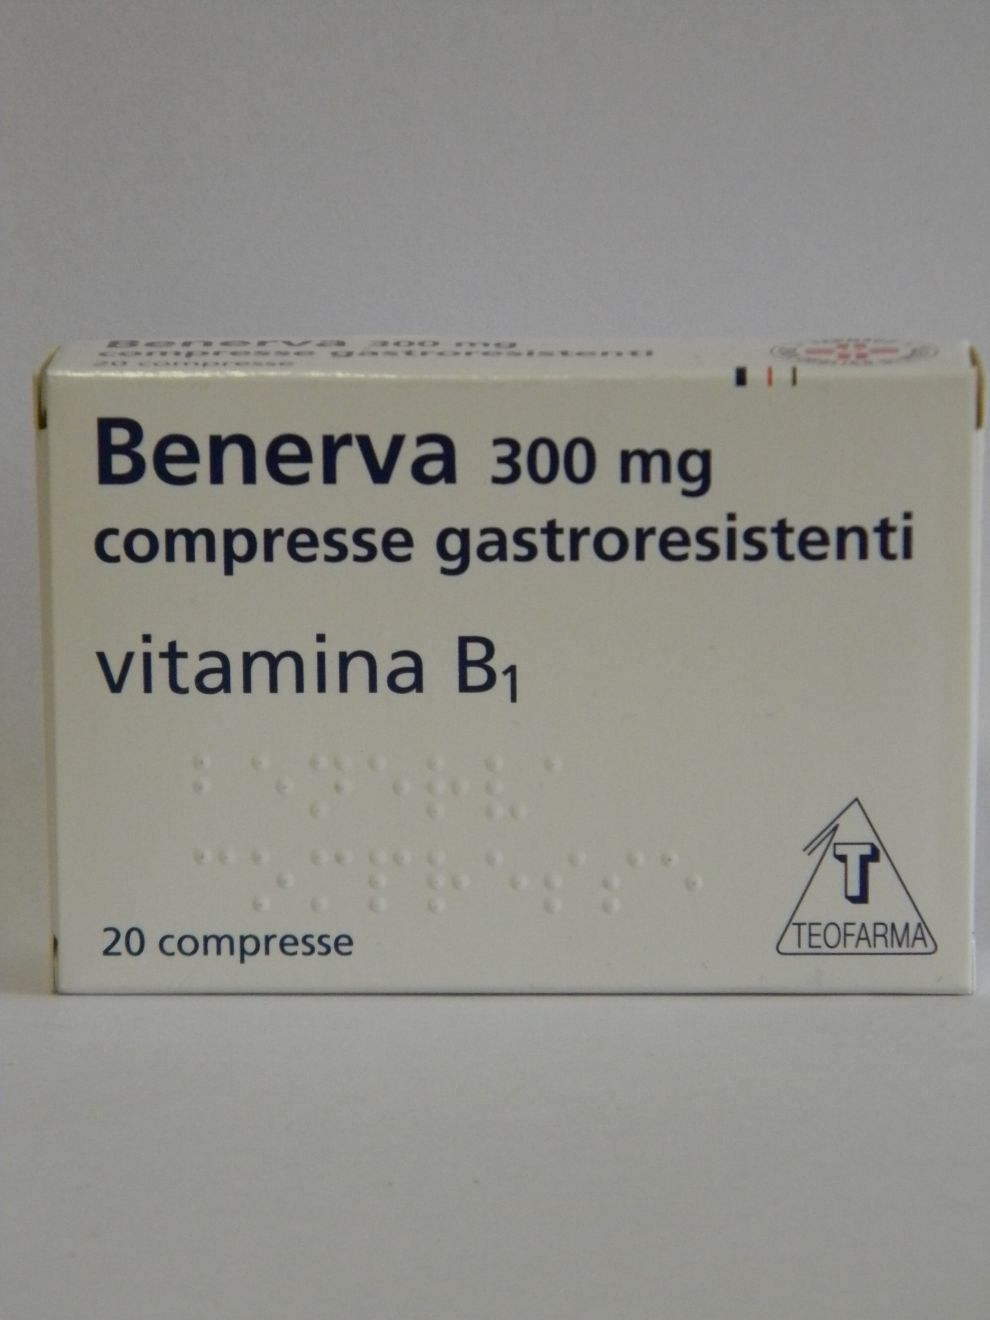 Benerva 300 Mg Compresse Gastroresistenti 20 Compresse